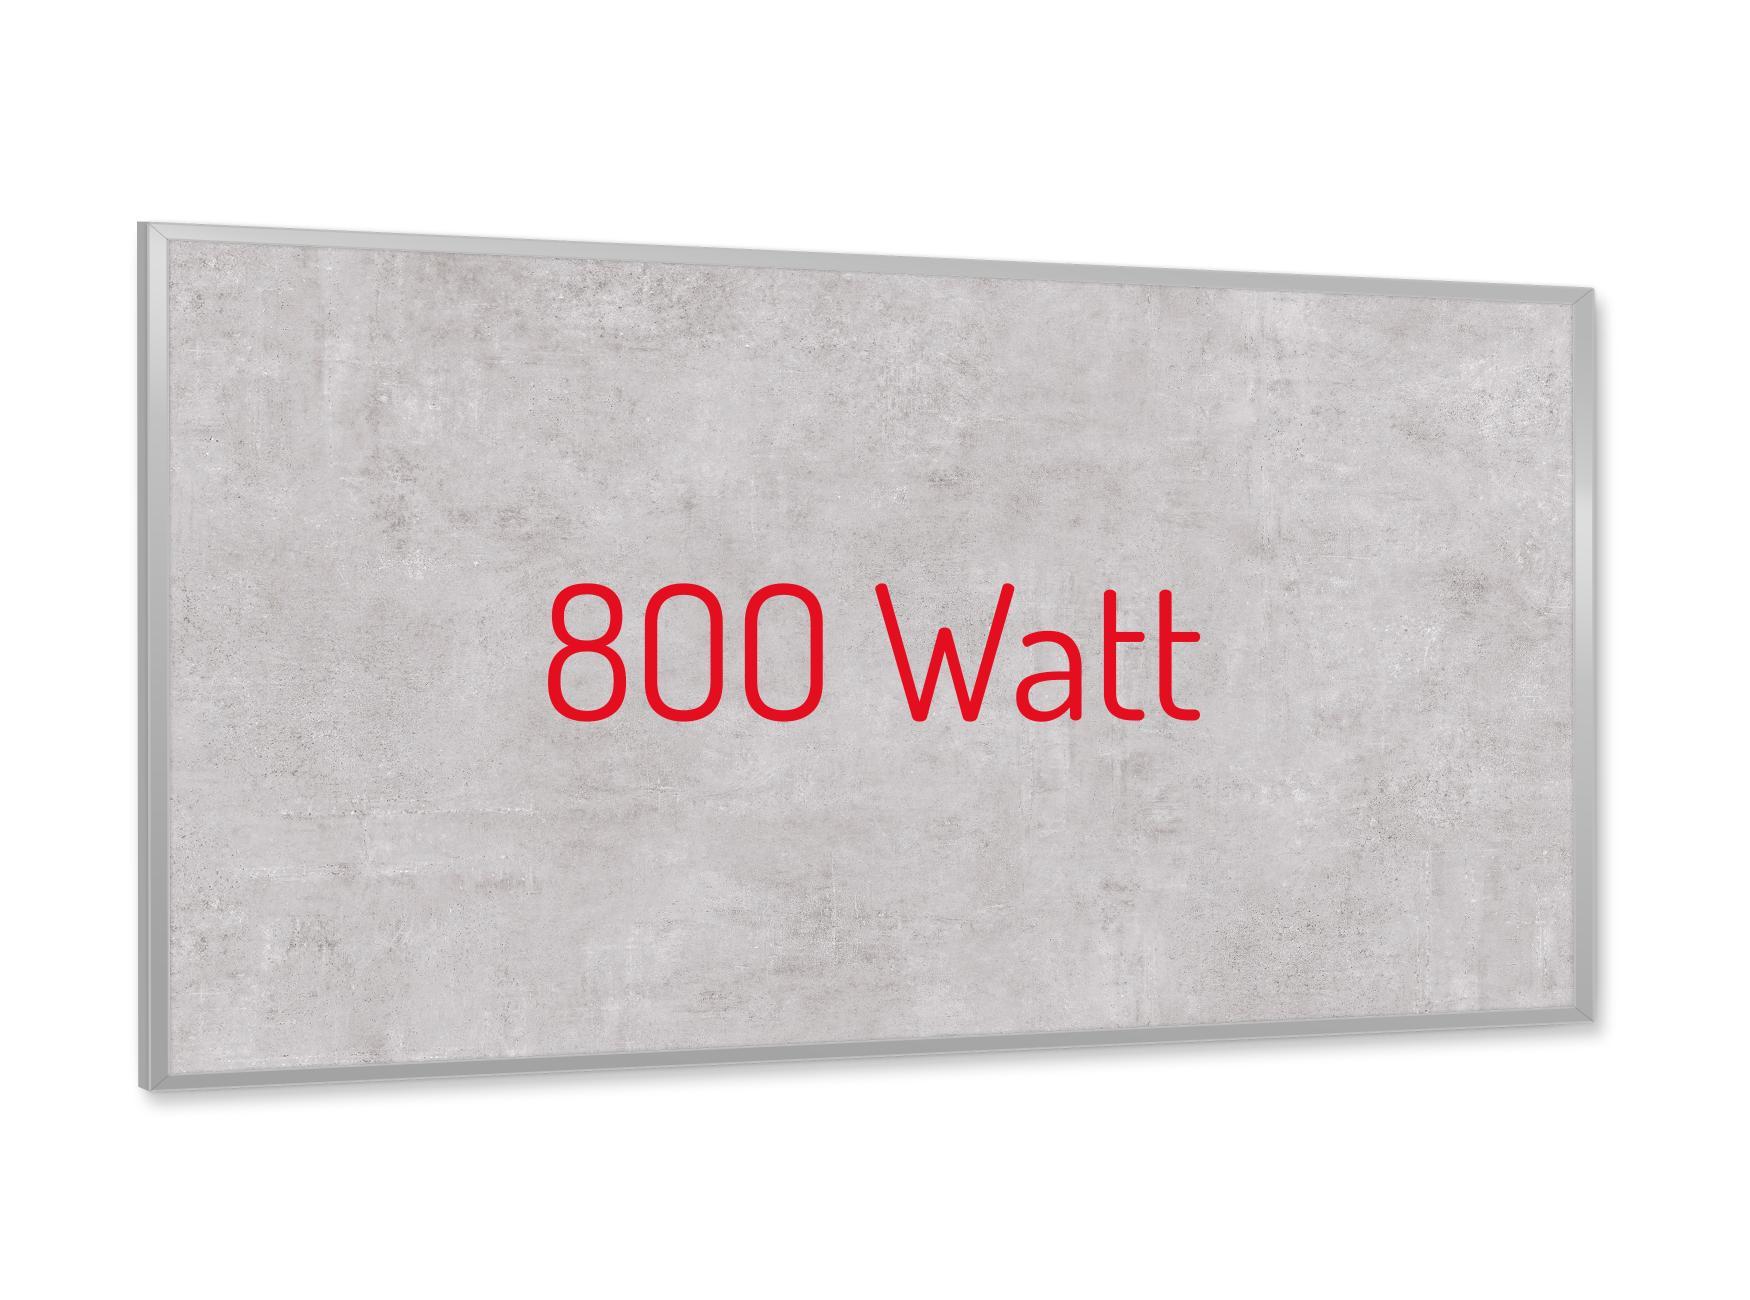 PowerSun Keramik Struktur Miami 800Watt 60x120cm